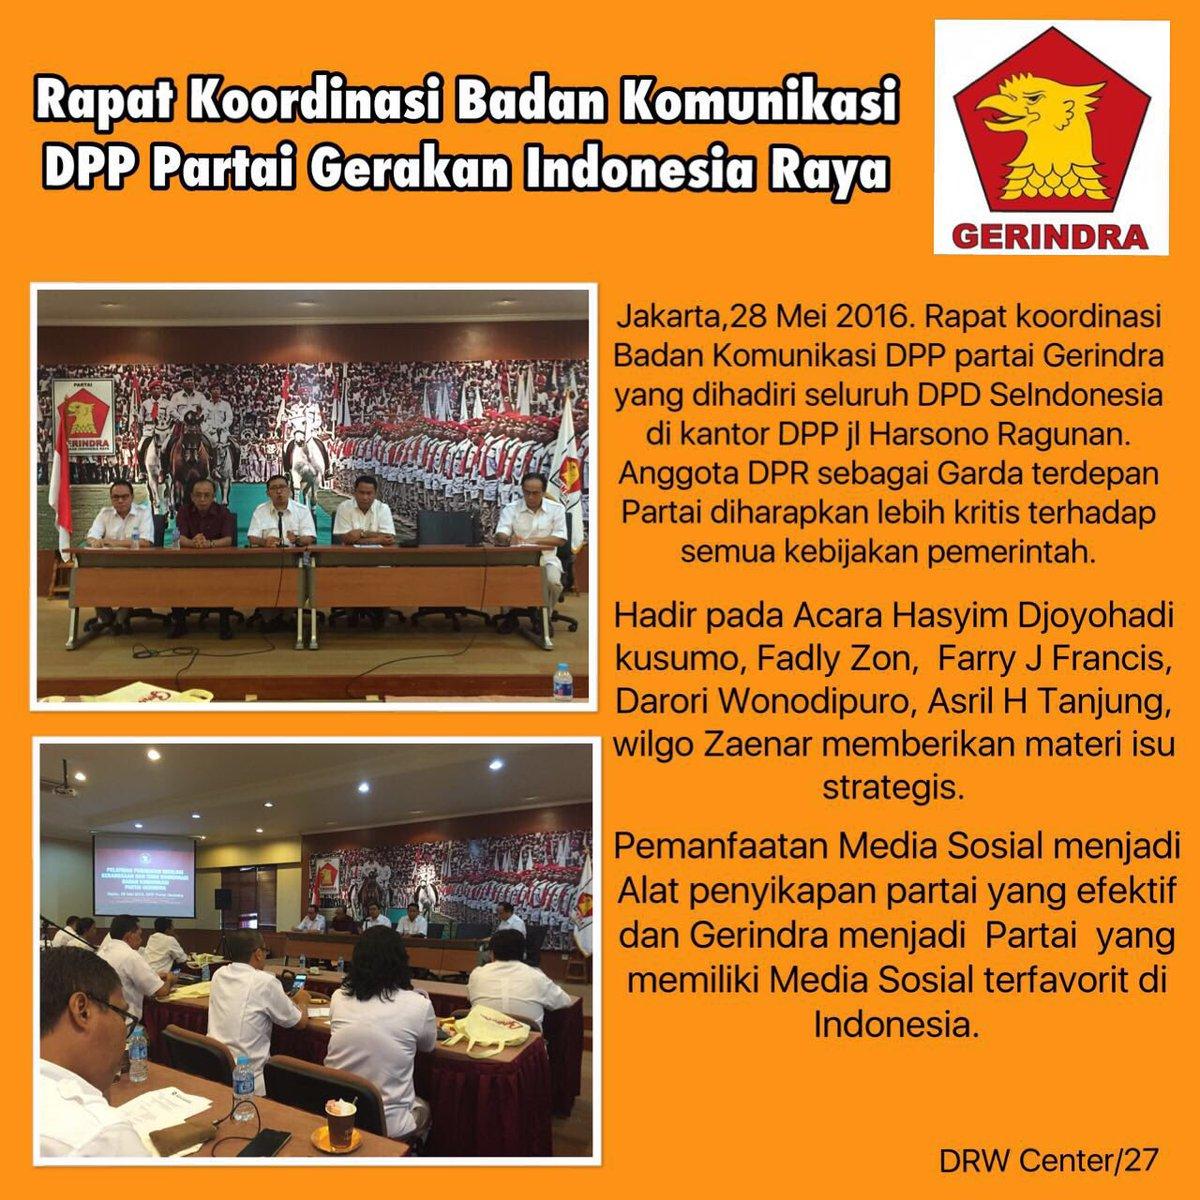 #anggotadprri #gerindra #komisi4 #jakarta #gerindraindonesia pic.twitter.com/mzp0jATz5P